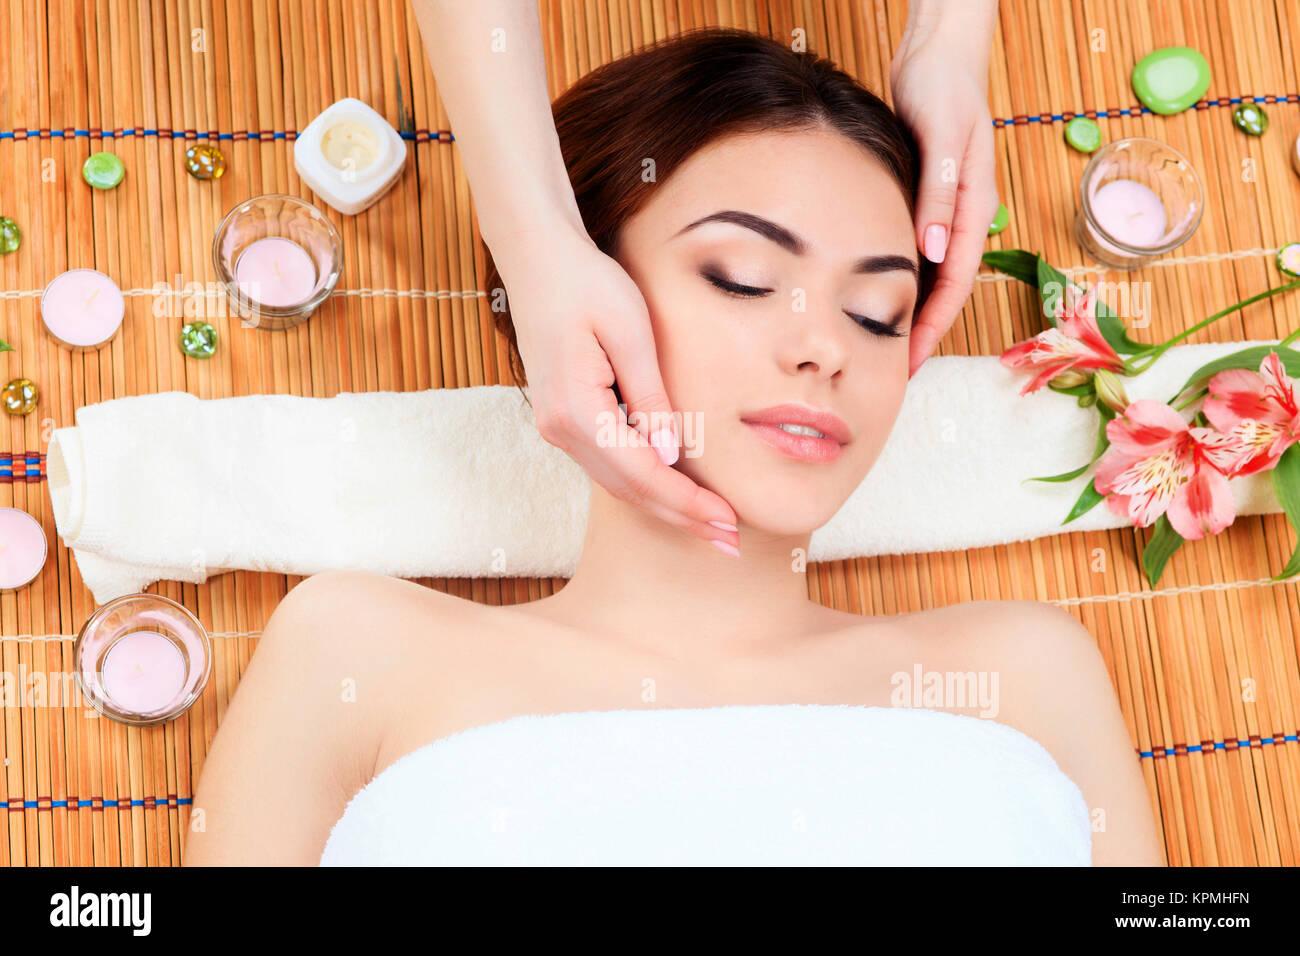 Beautiful young woman at a spa salon - Stock Image